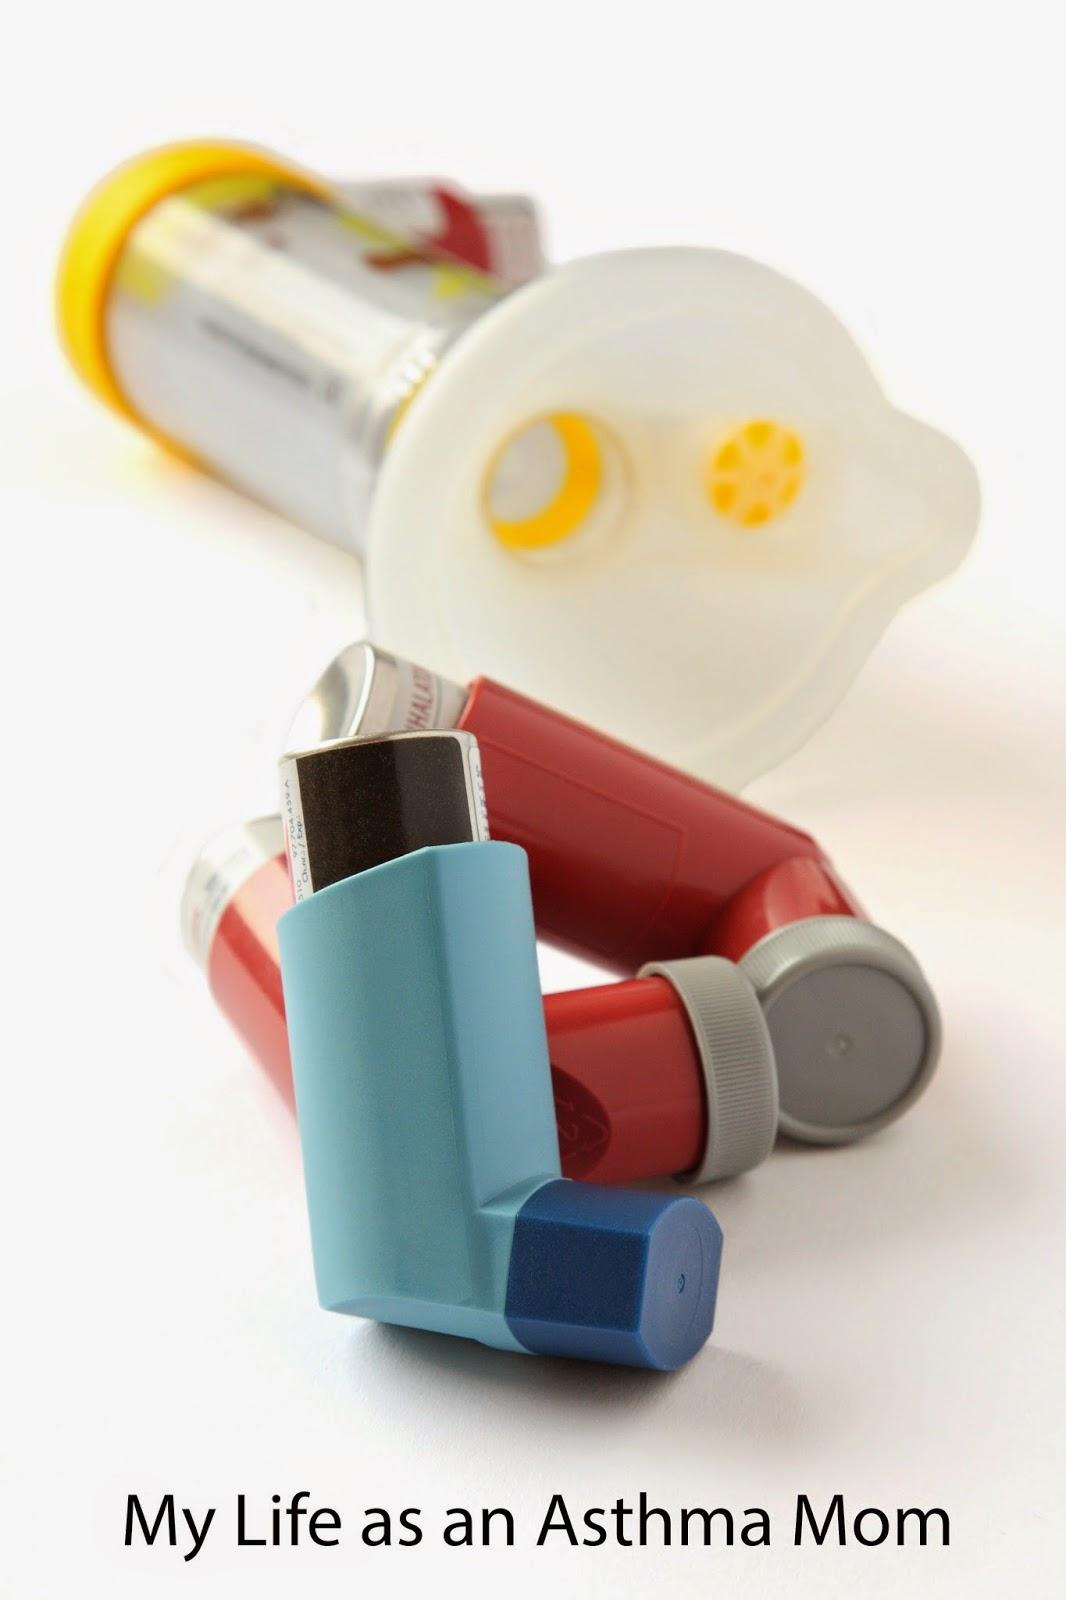 My Life As An Asthma Mom Maintenance Inhaler Vs Rescue Inhaler